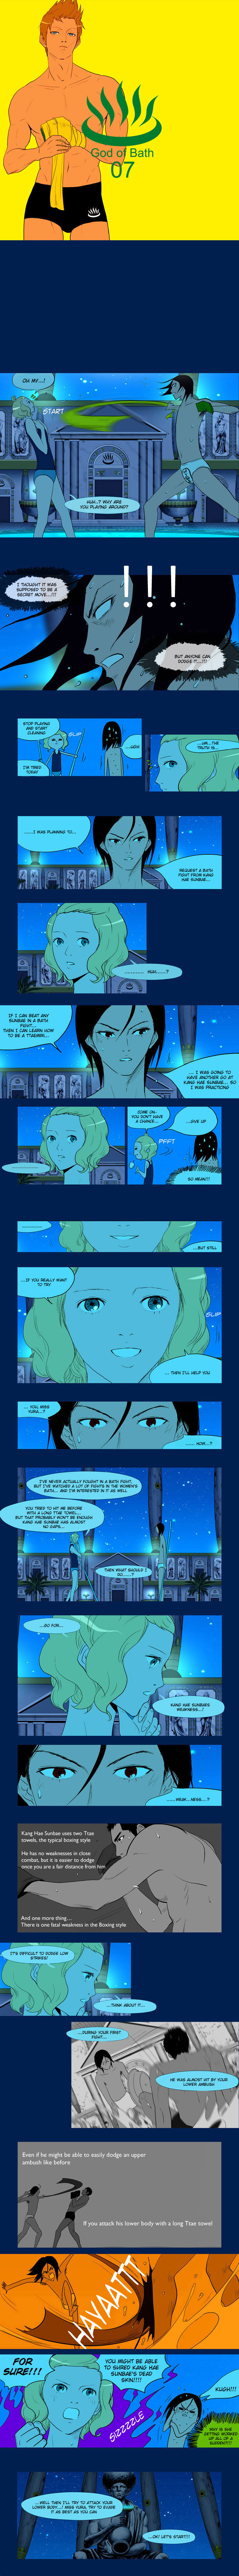 God of Bath 7 Page 1